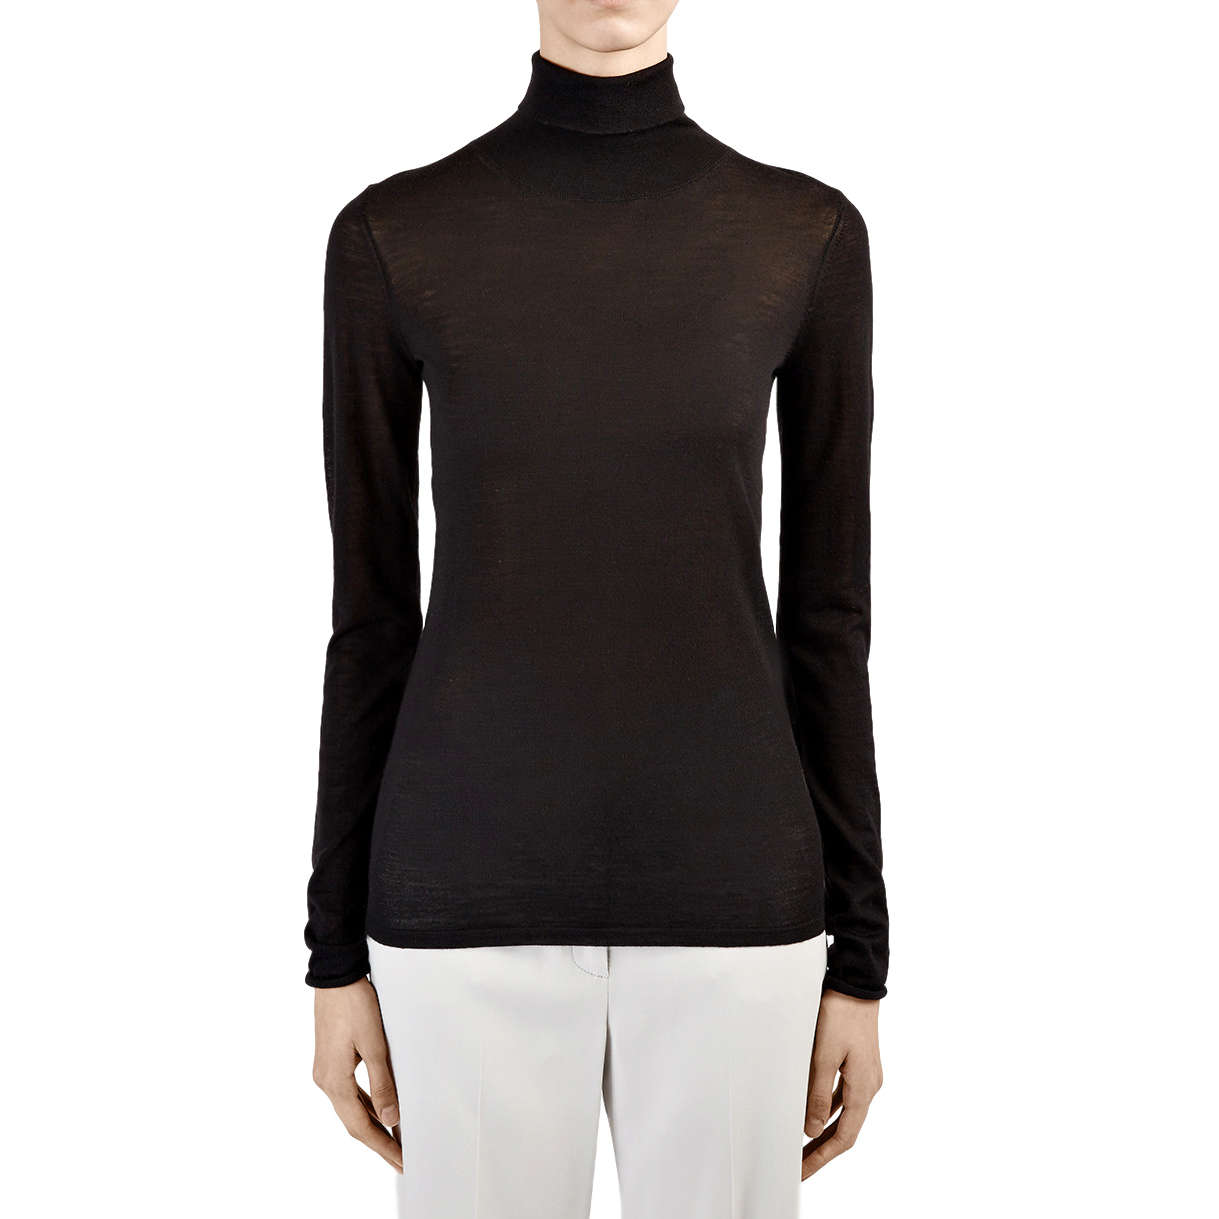 Joseph Black Sheer Knit Rollneck Sweater